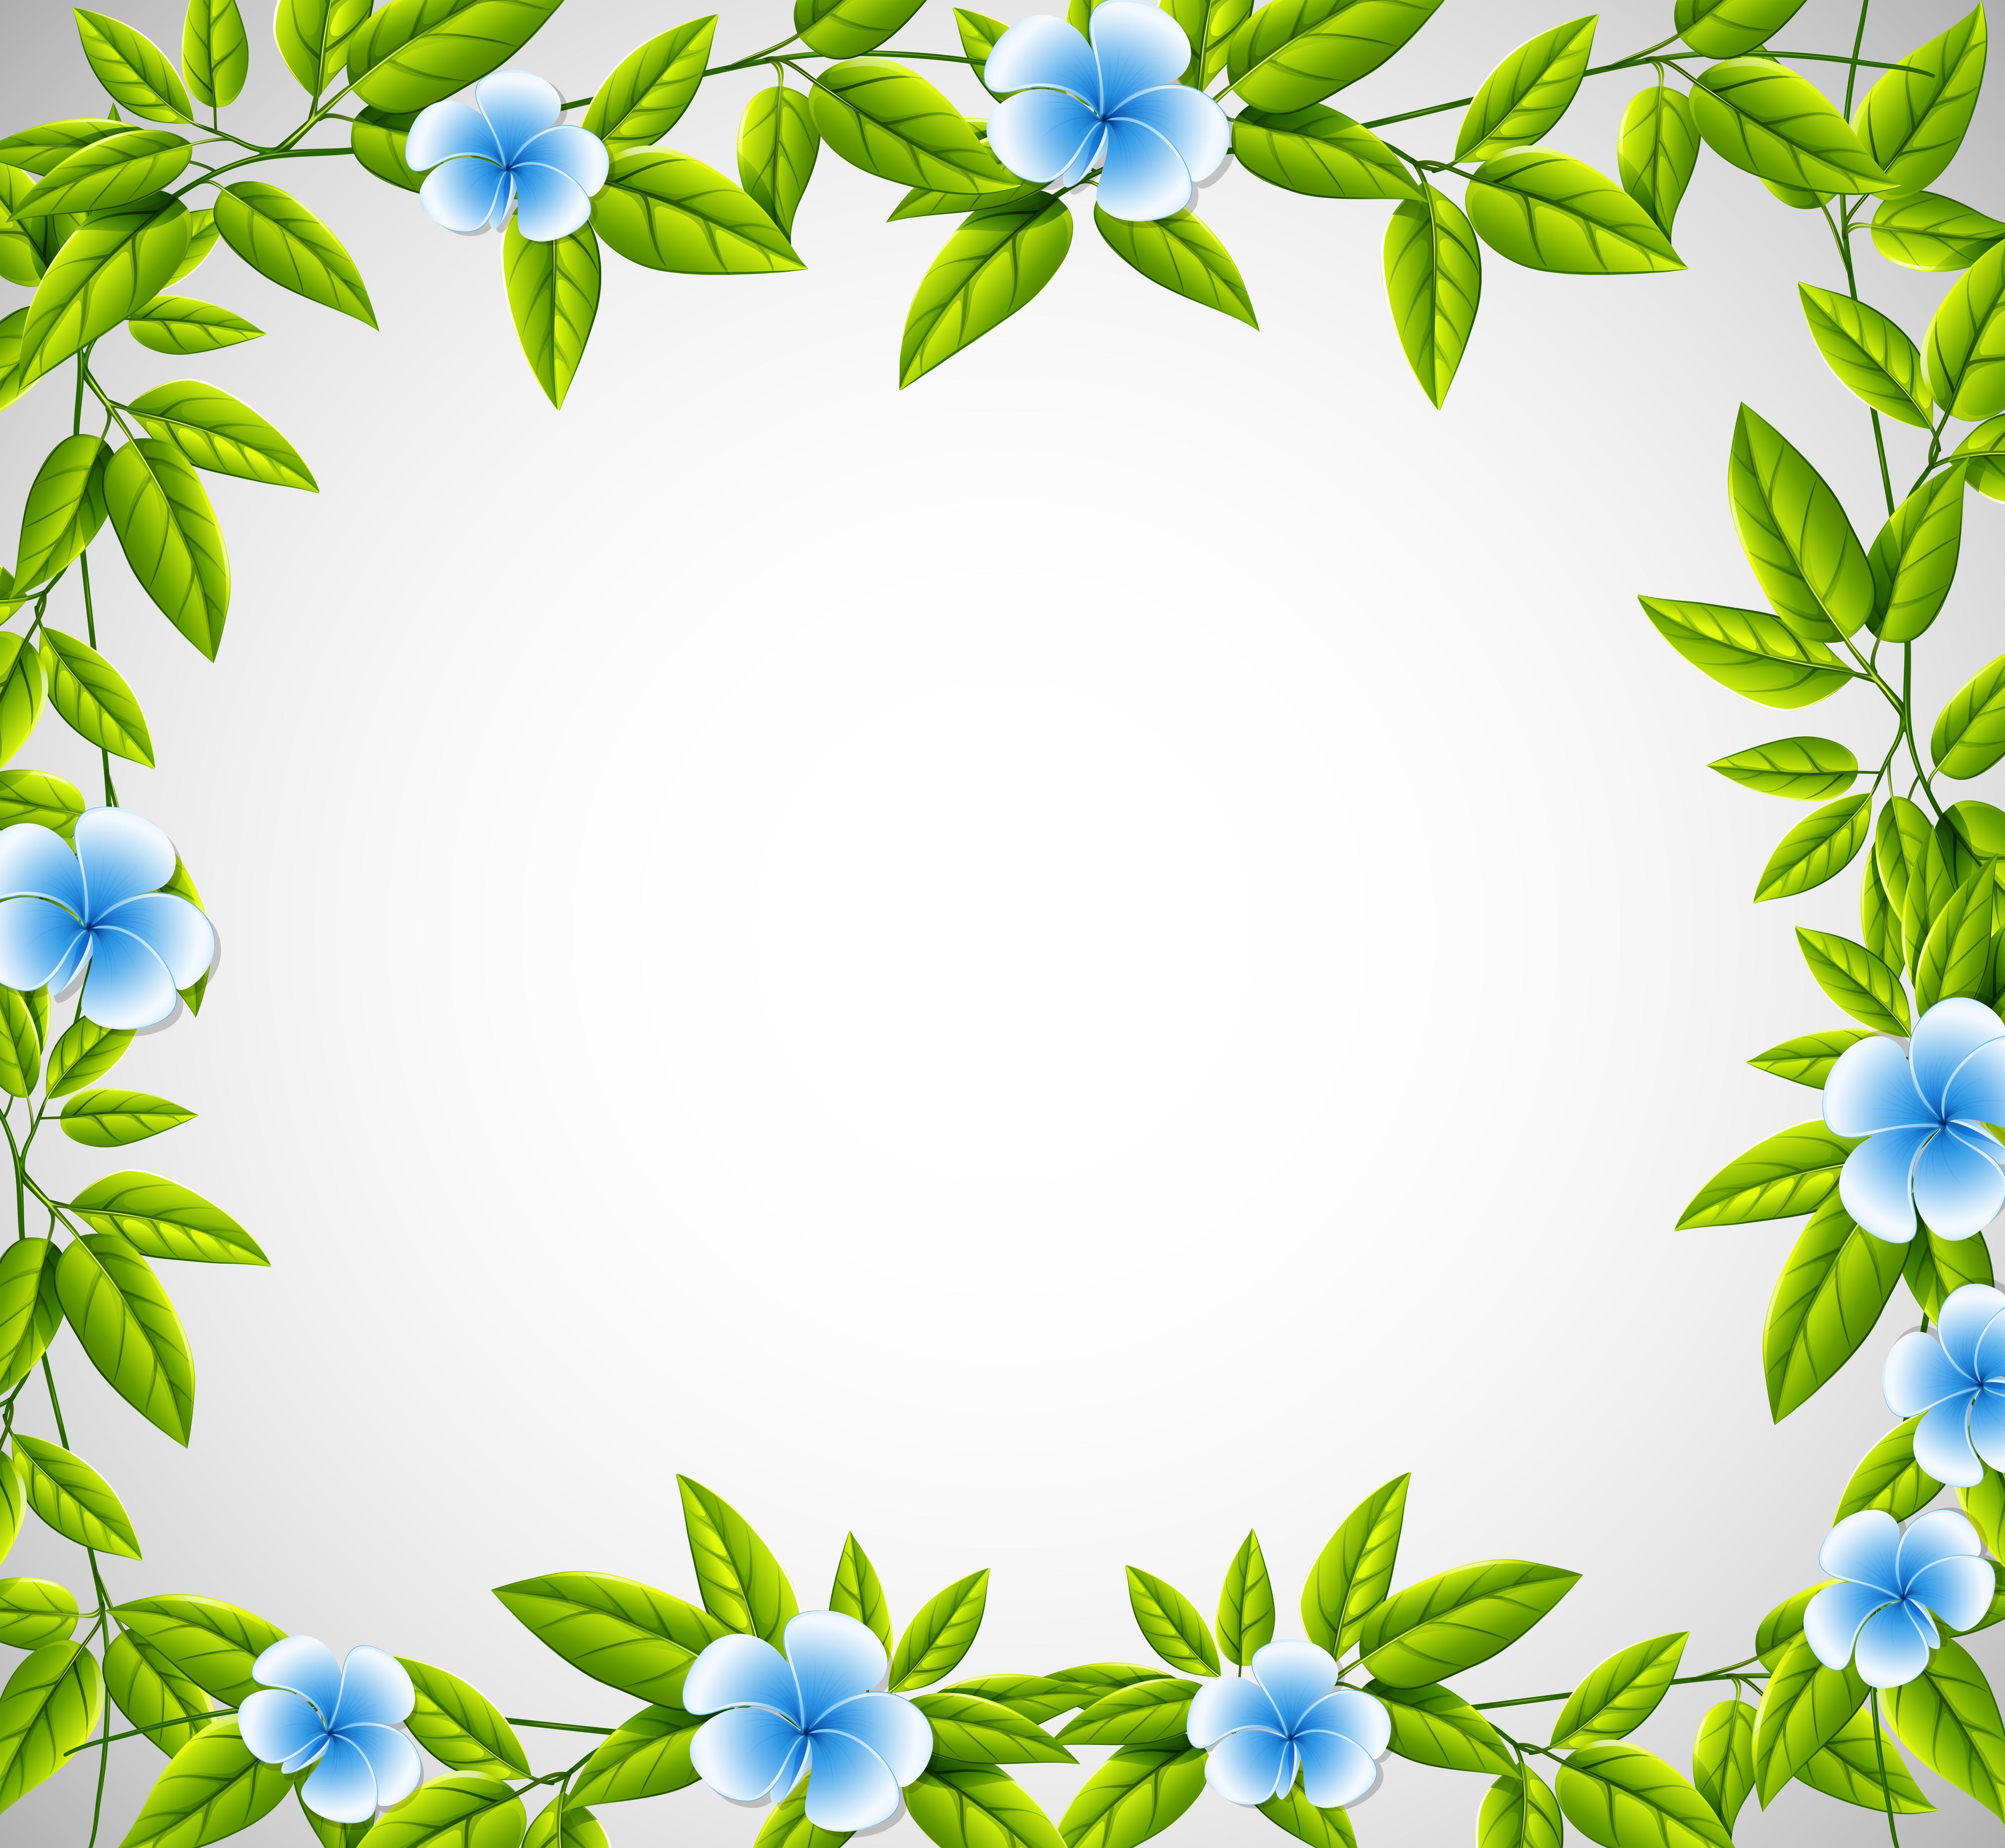 blue flower nature frame download free vectors clipart graphics vector art vecteezy